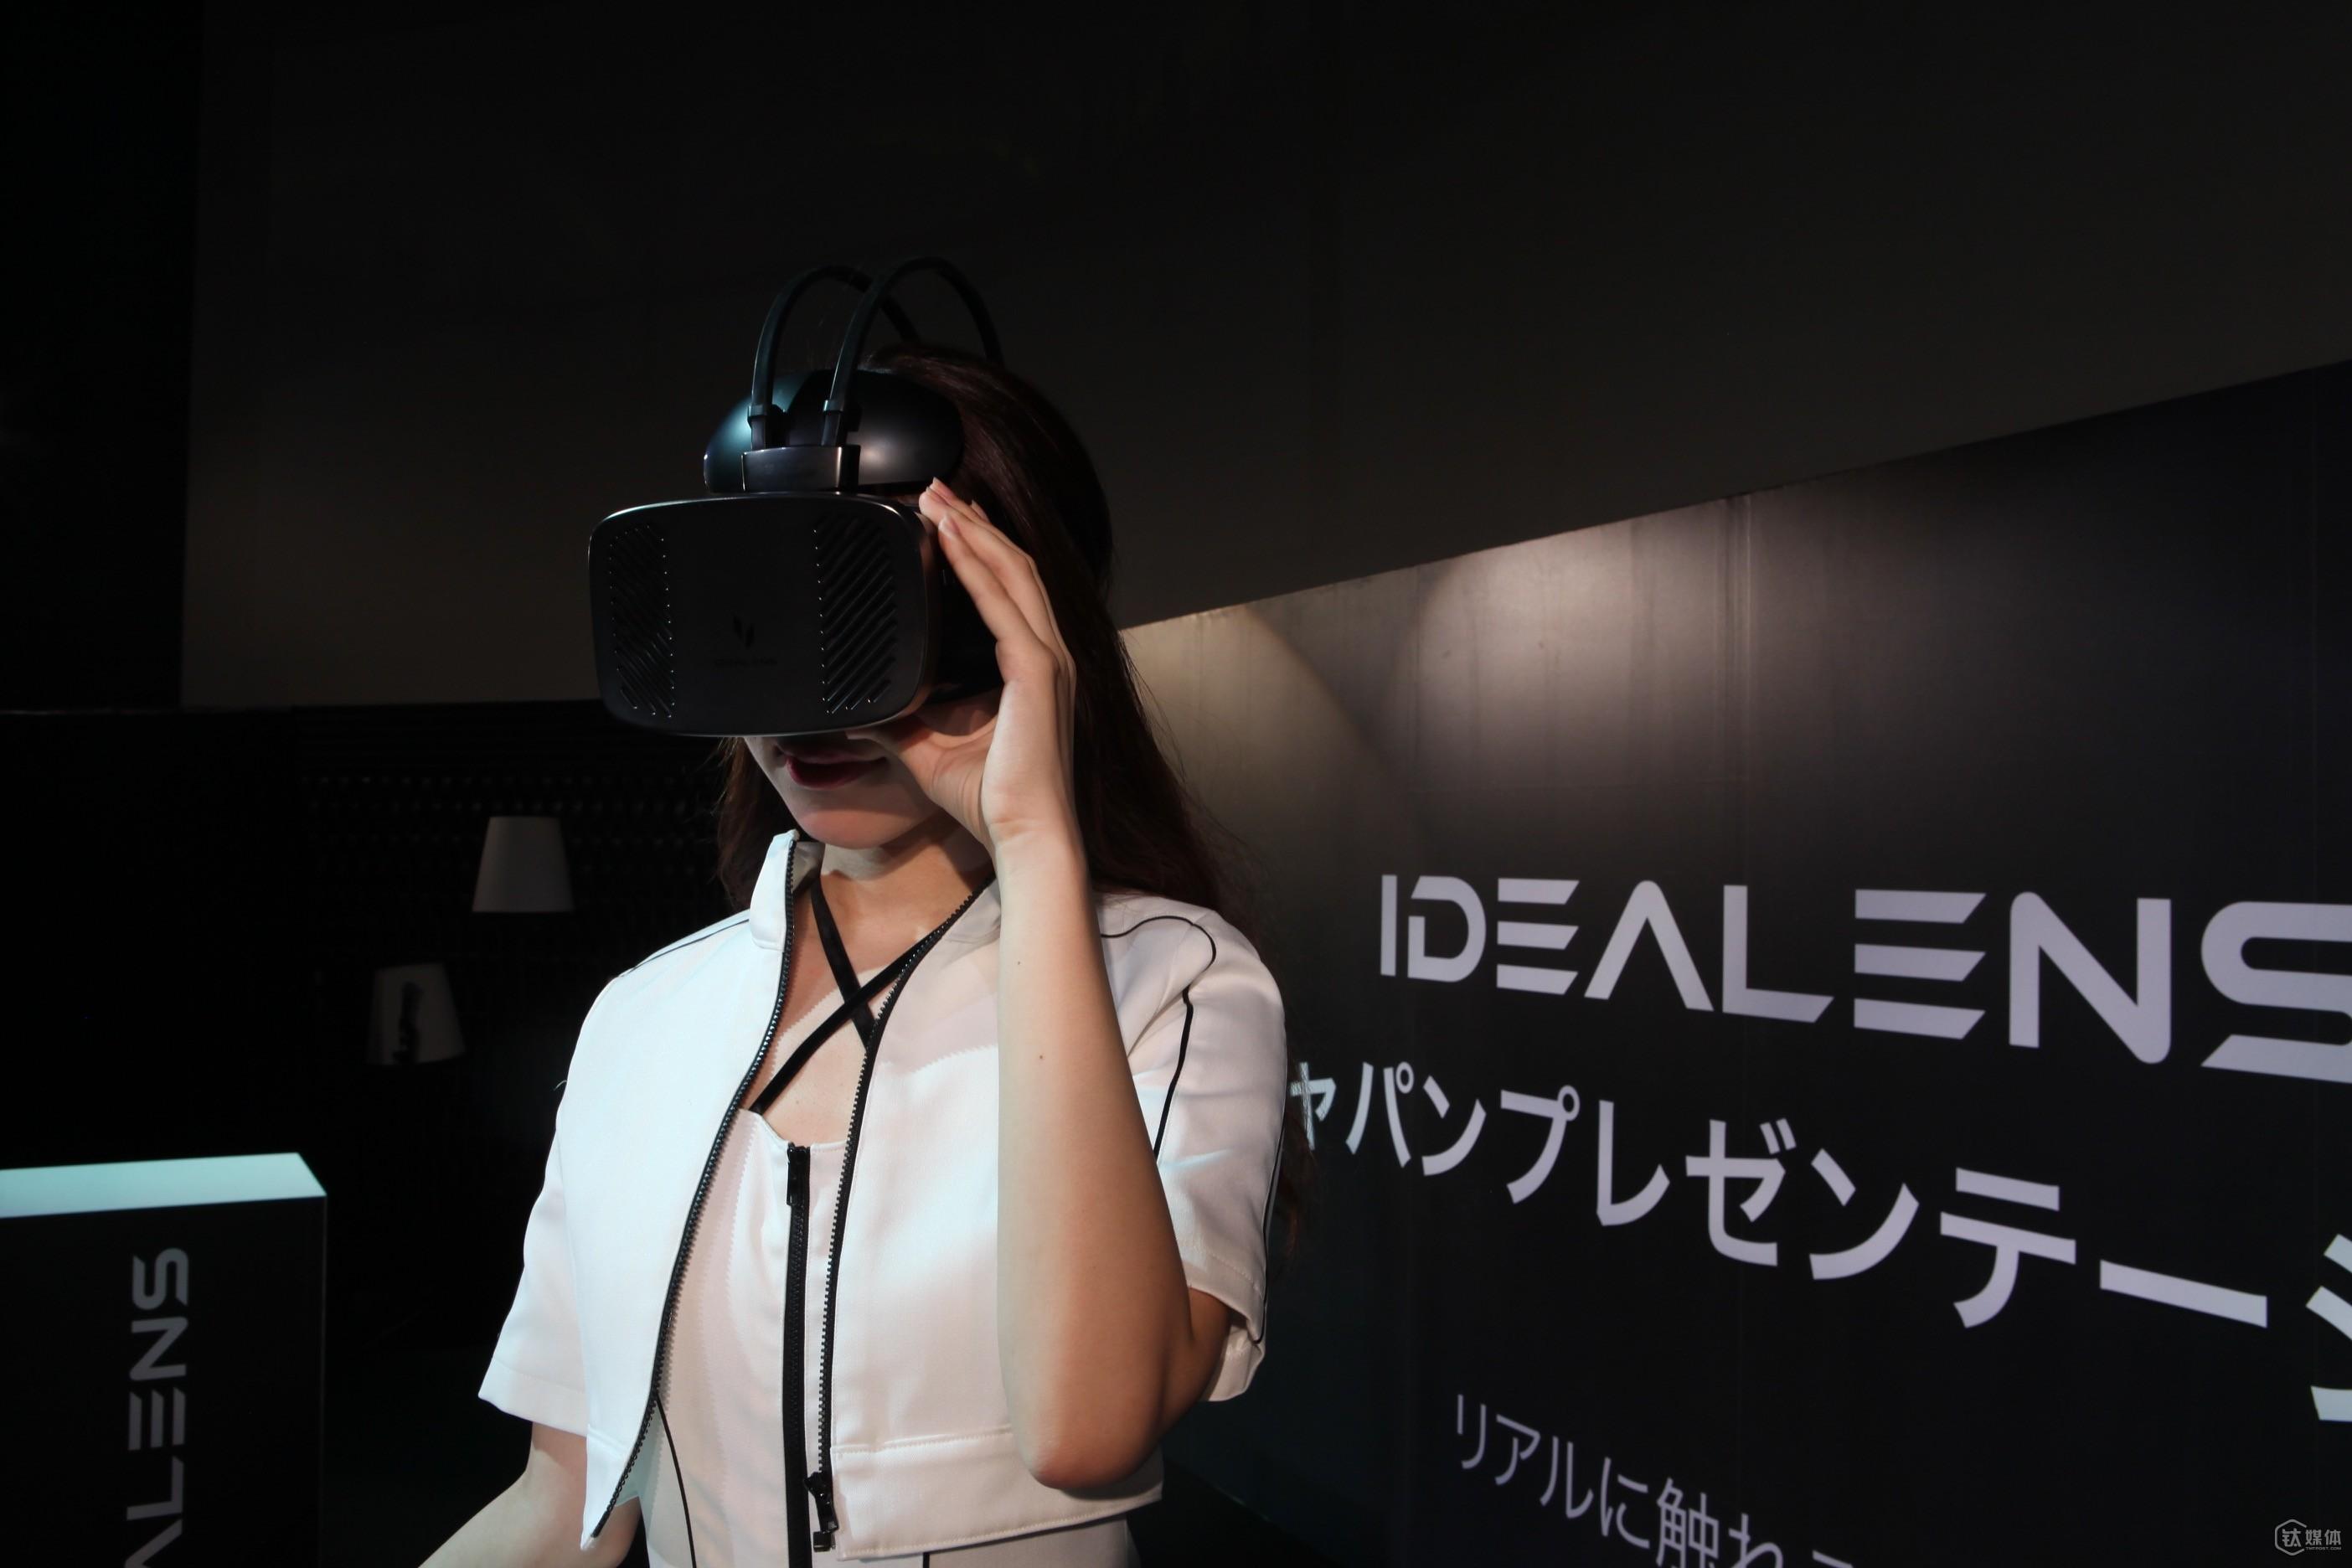 IDEALENS在东京发布的第二代一体机产品 IDEALENS K2